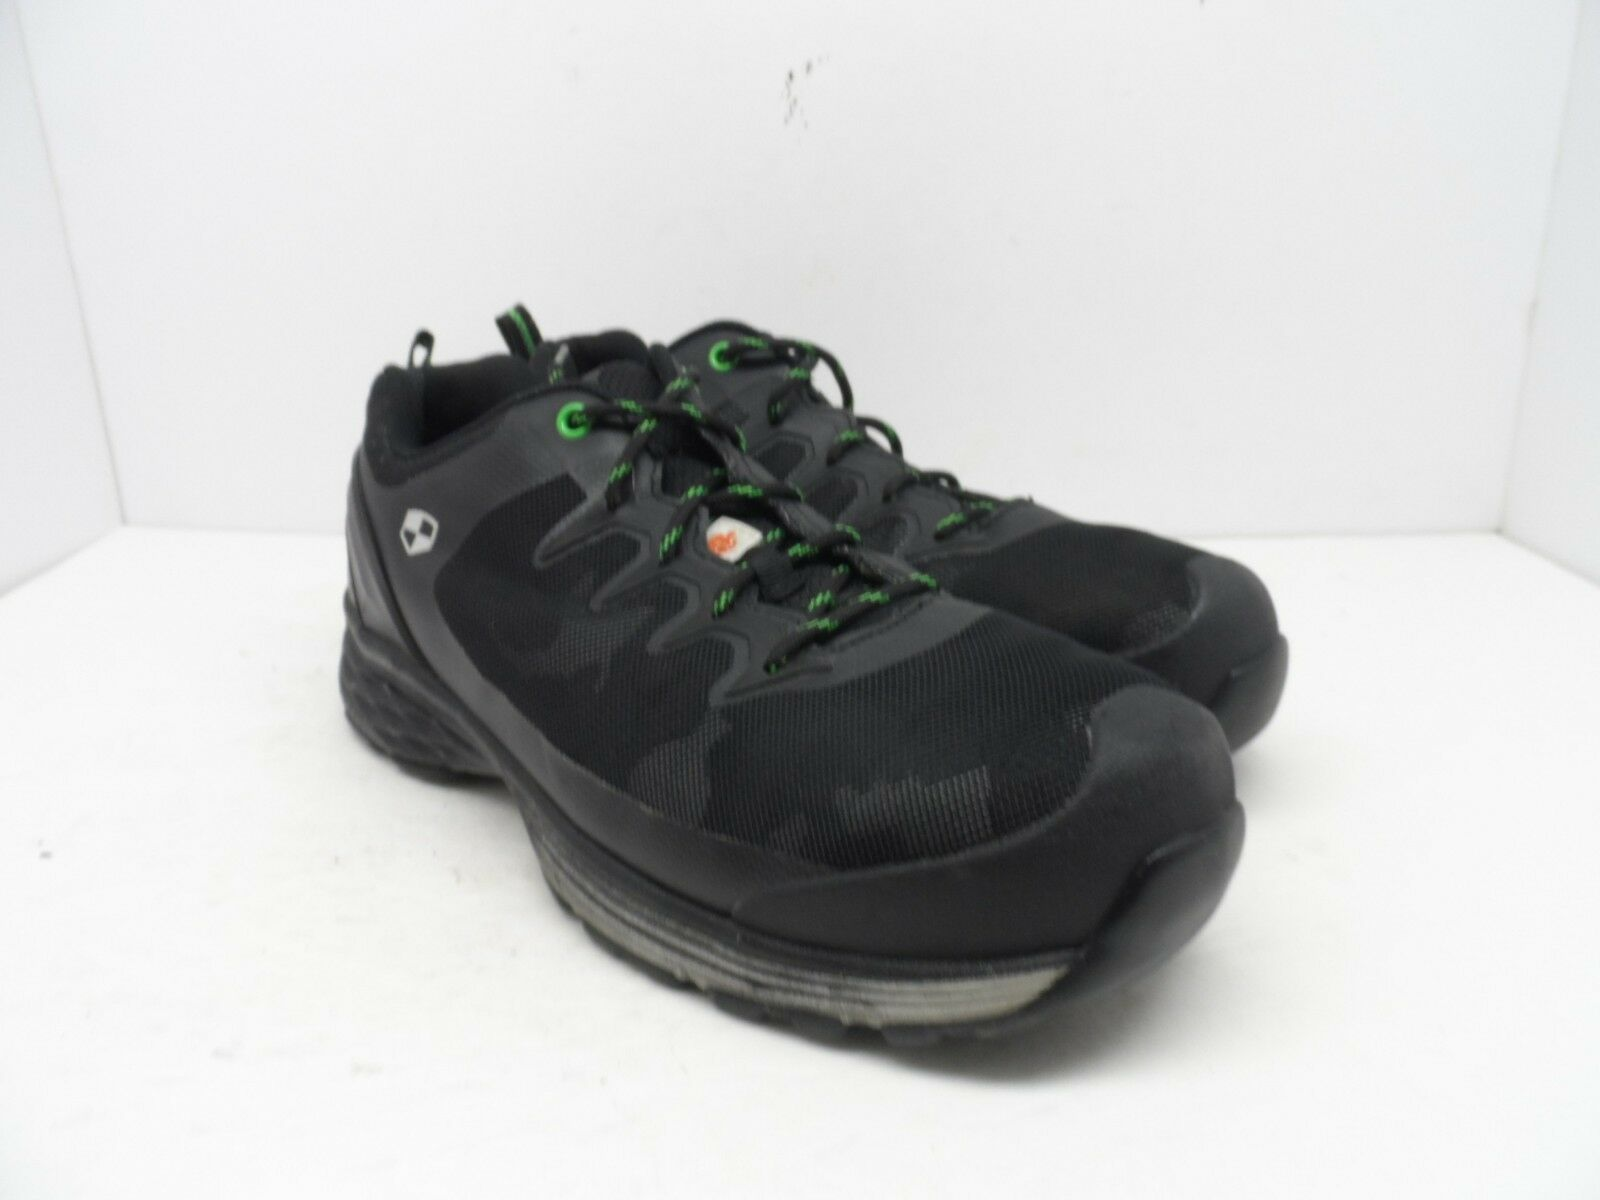 1ad3cea51 WORK PRO Men's Aluminium Toe Steel Plate Welded Athletic Shoes Black/Green  10EE